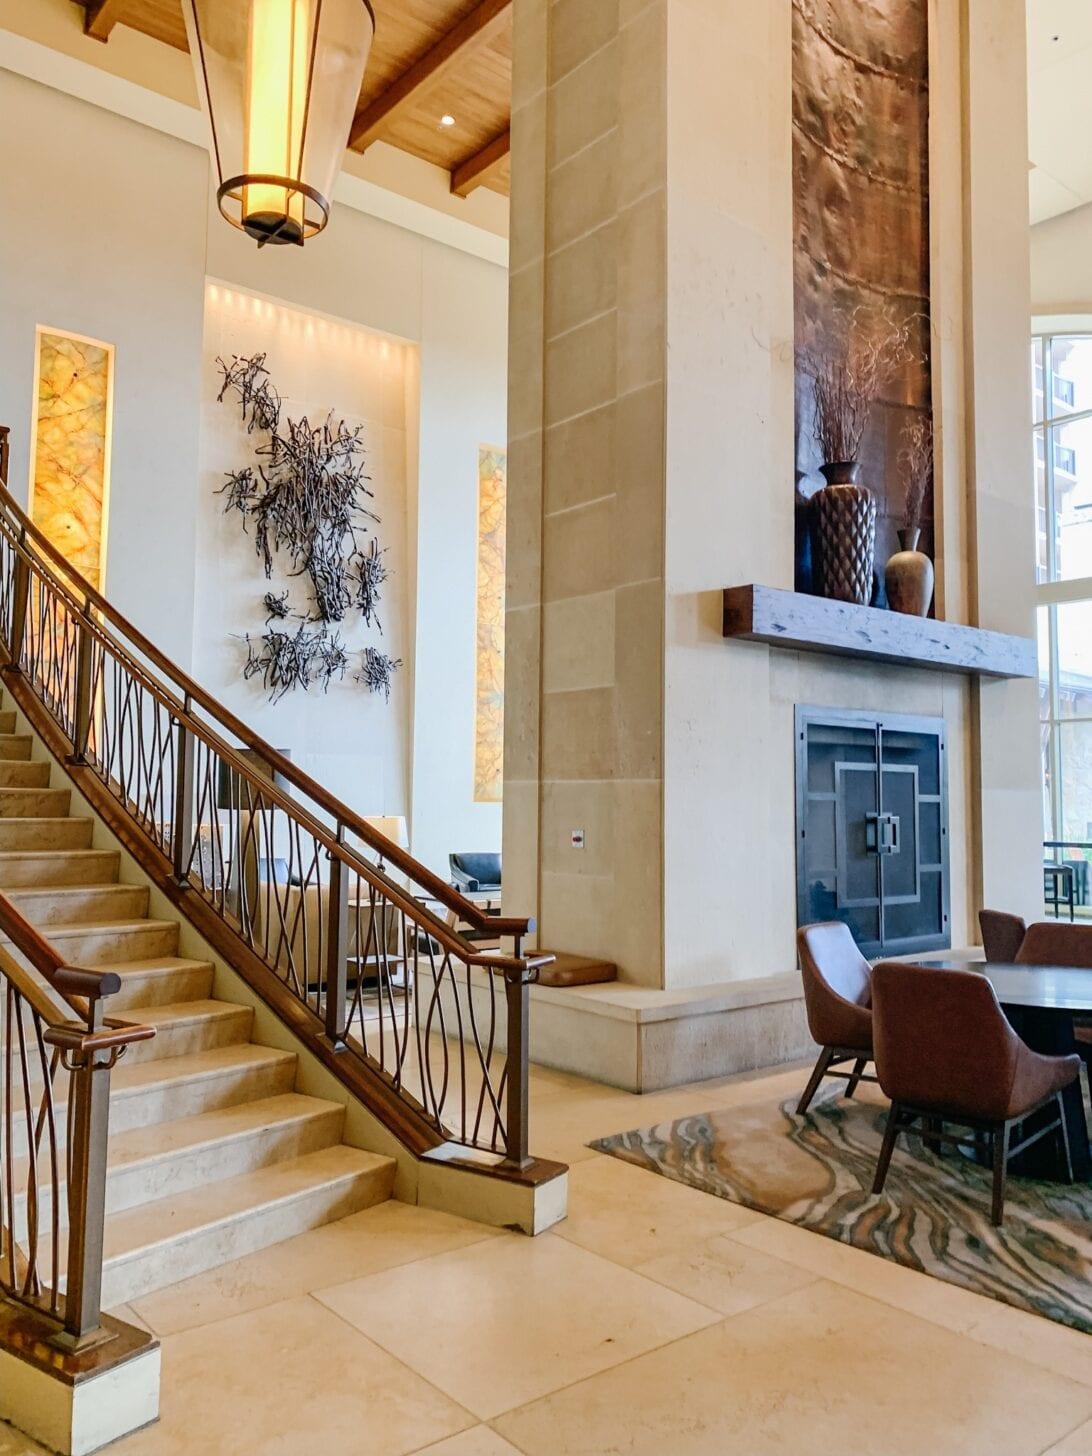 HOTEL LOBBY, JW MARRIOT San Antonio, JW Marriot Resort